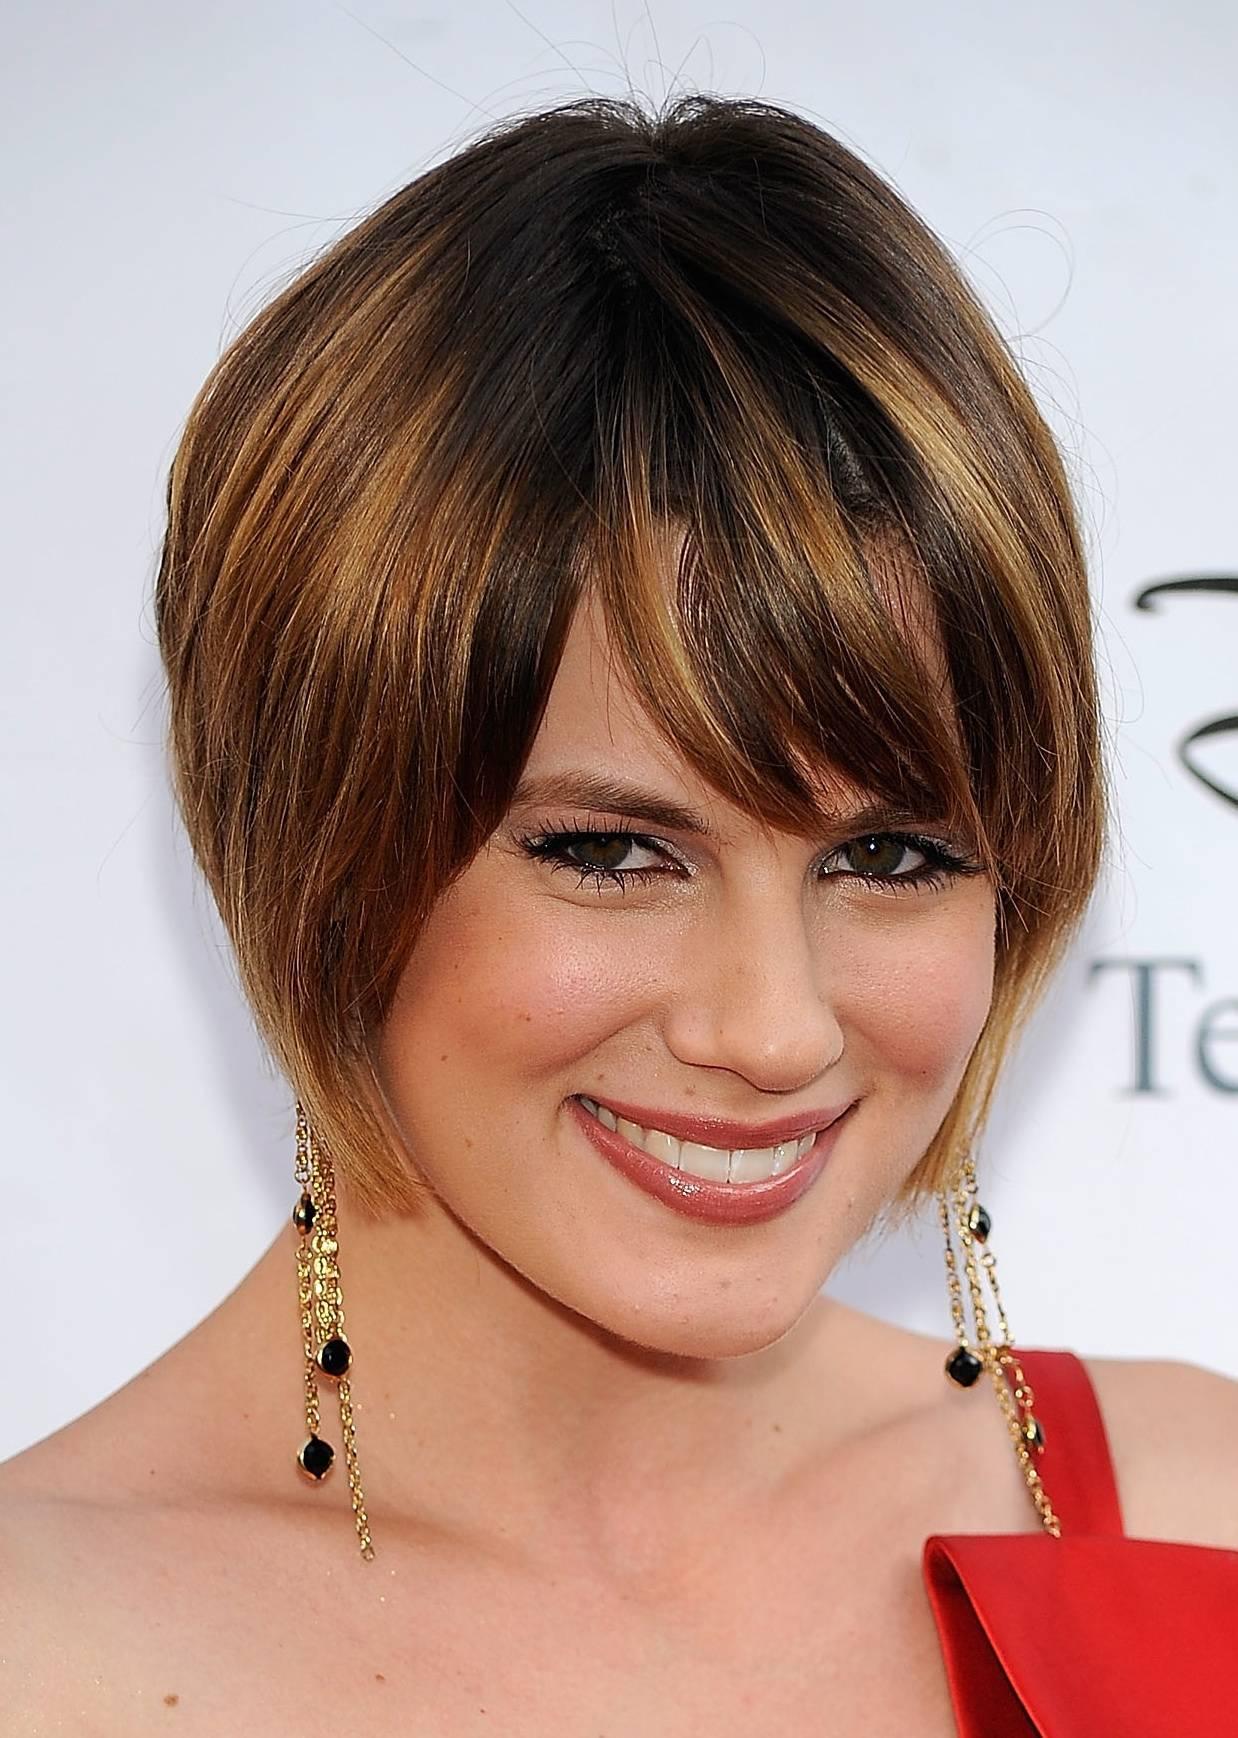 Groovy 23 Cute Short Hairstyles With Bangs Styles Weekly Short Hairstyles Gunalazisus